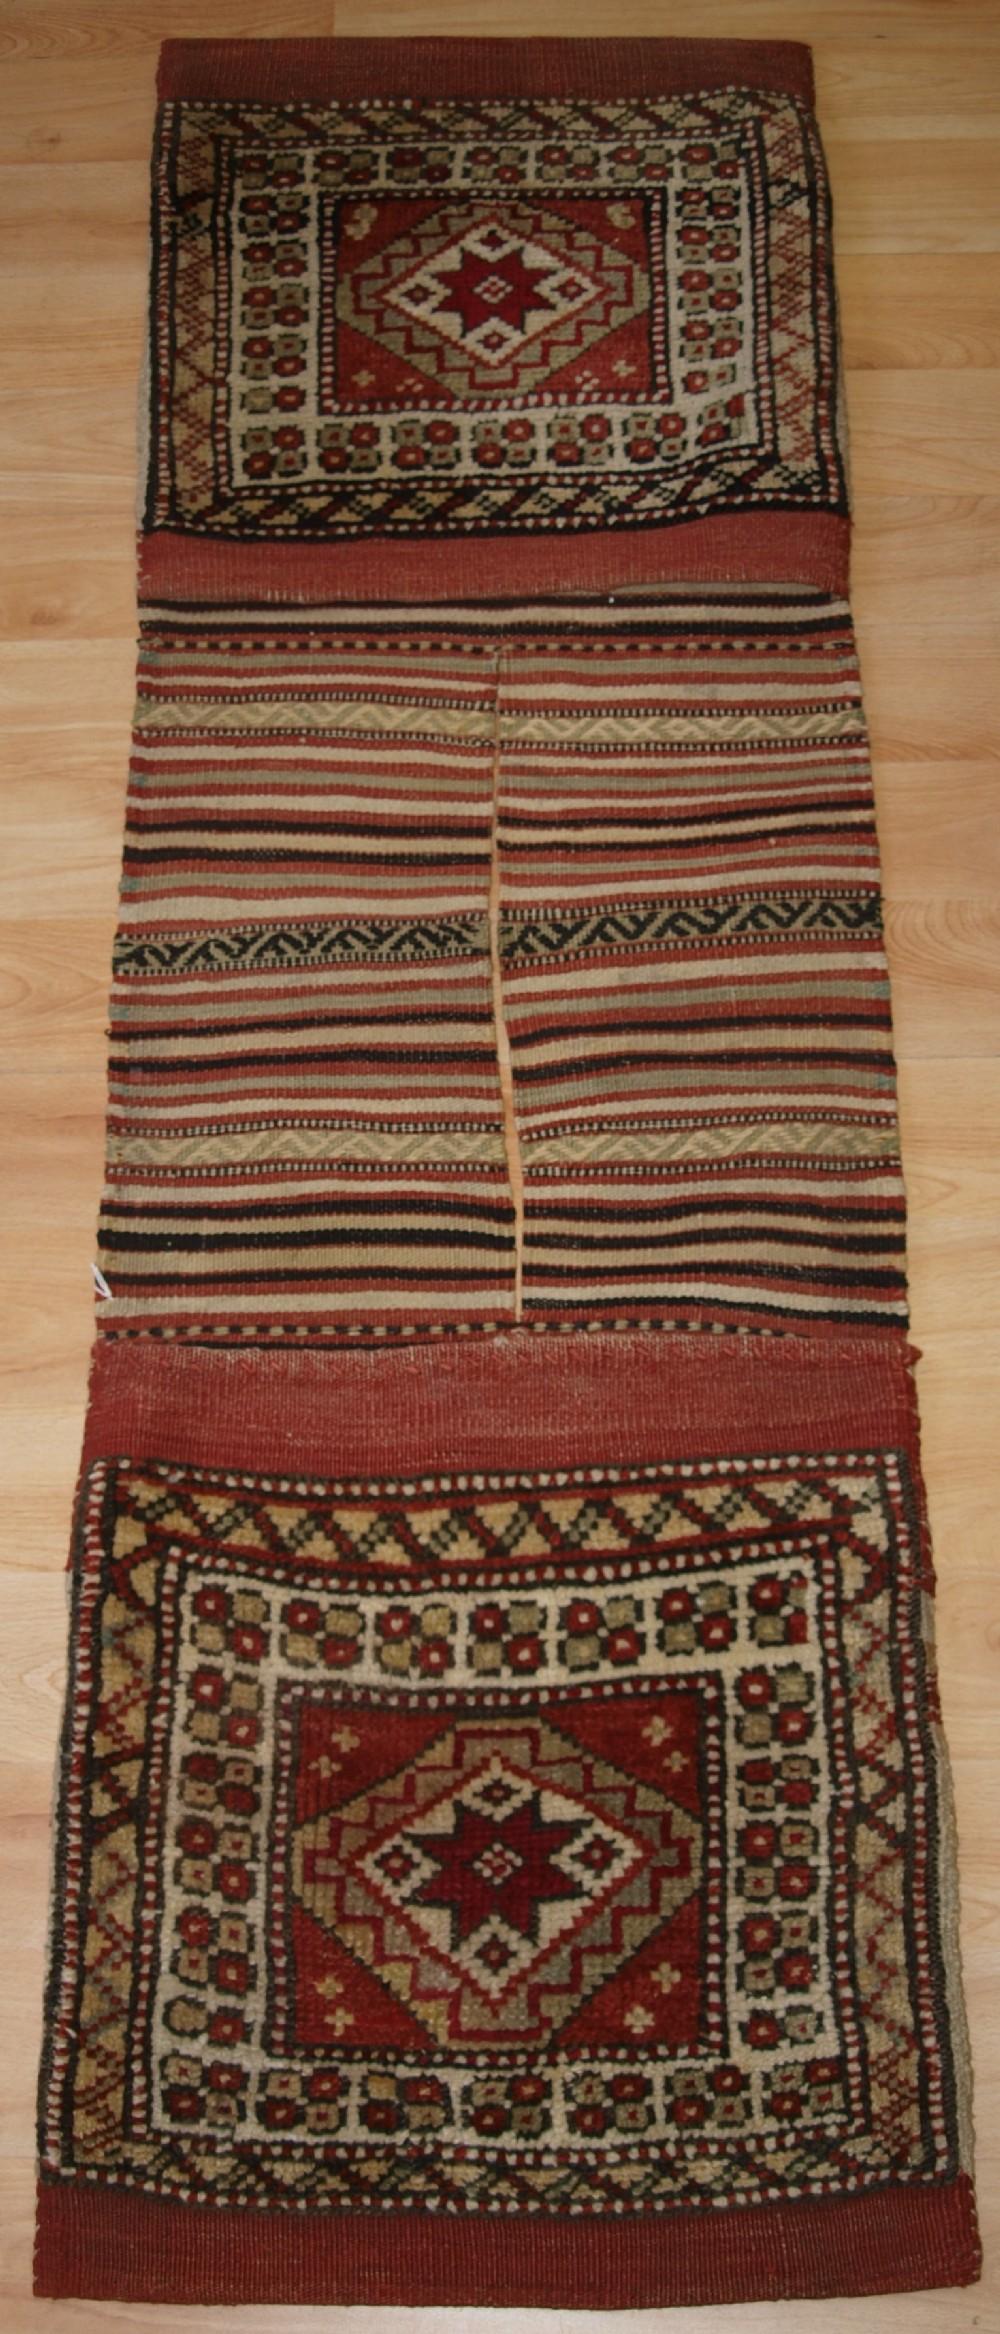 antique complete turkish bergama region heybe saddle bag outstanding condition circa 1900